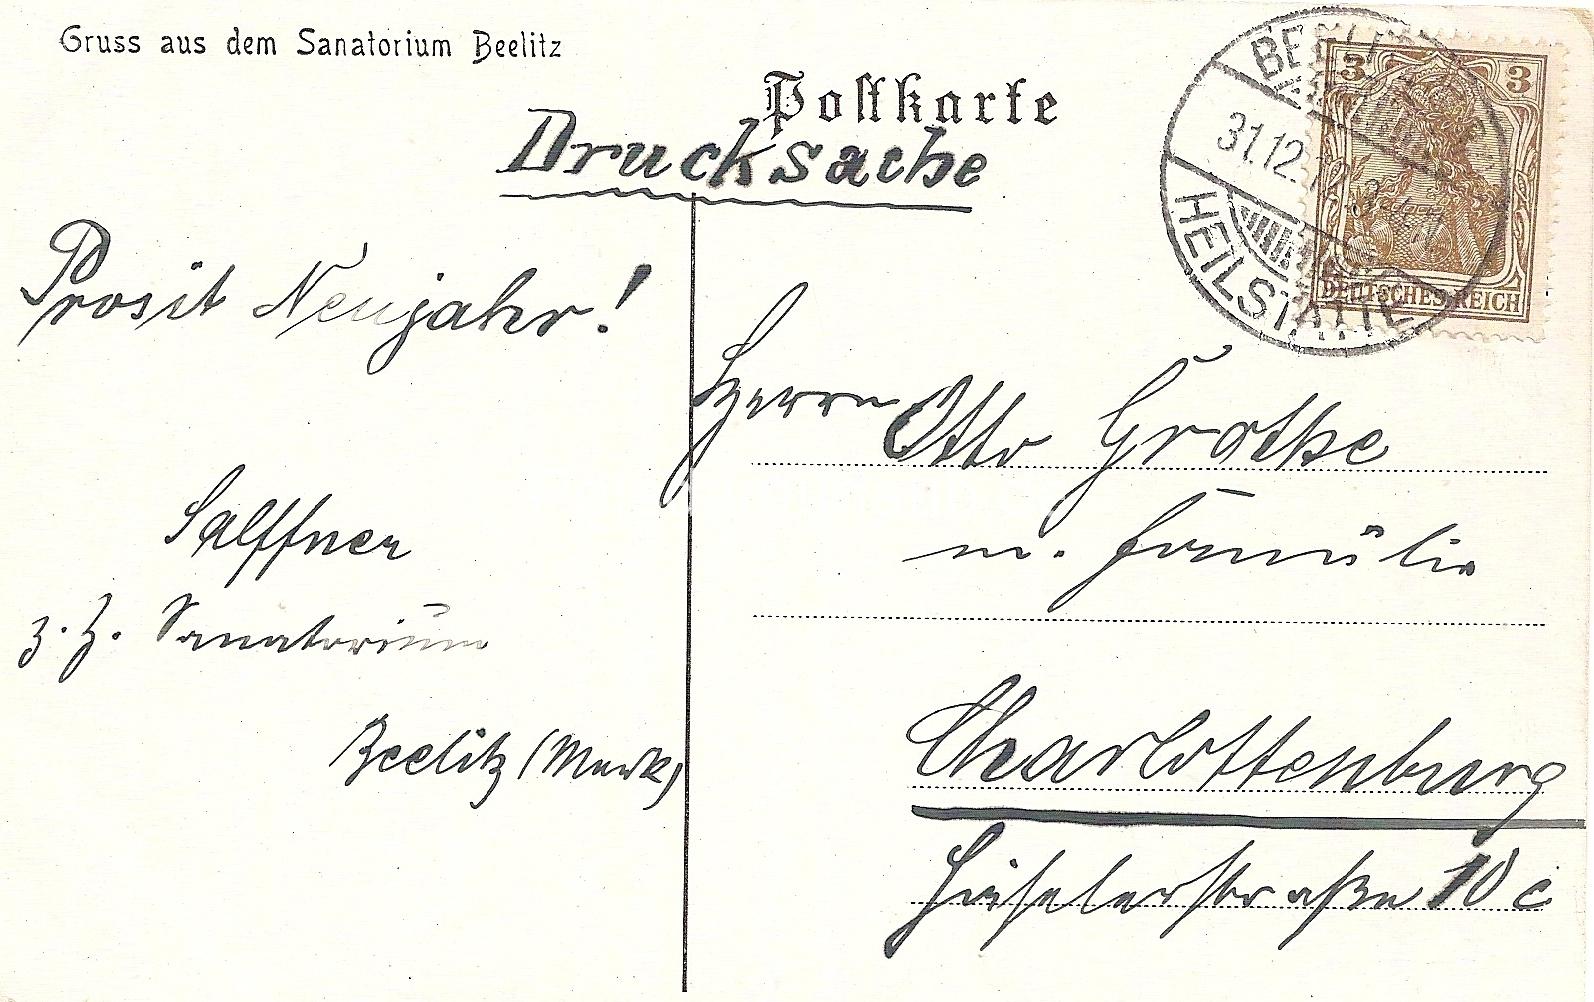 1912 12 31 II